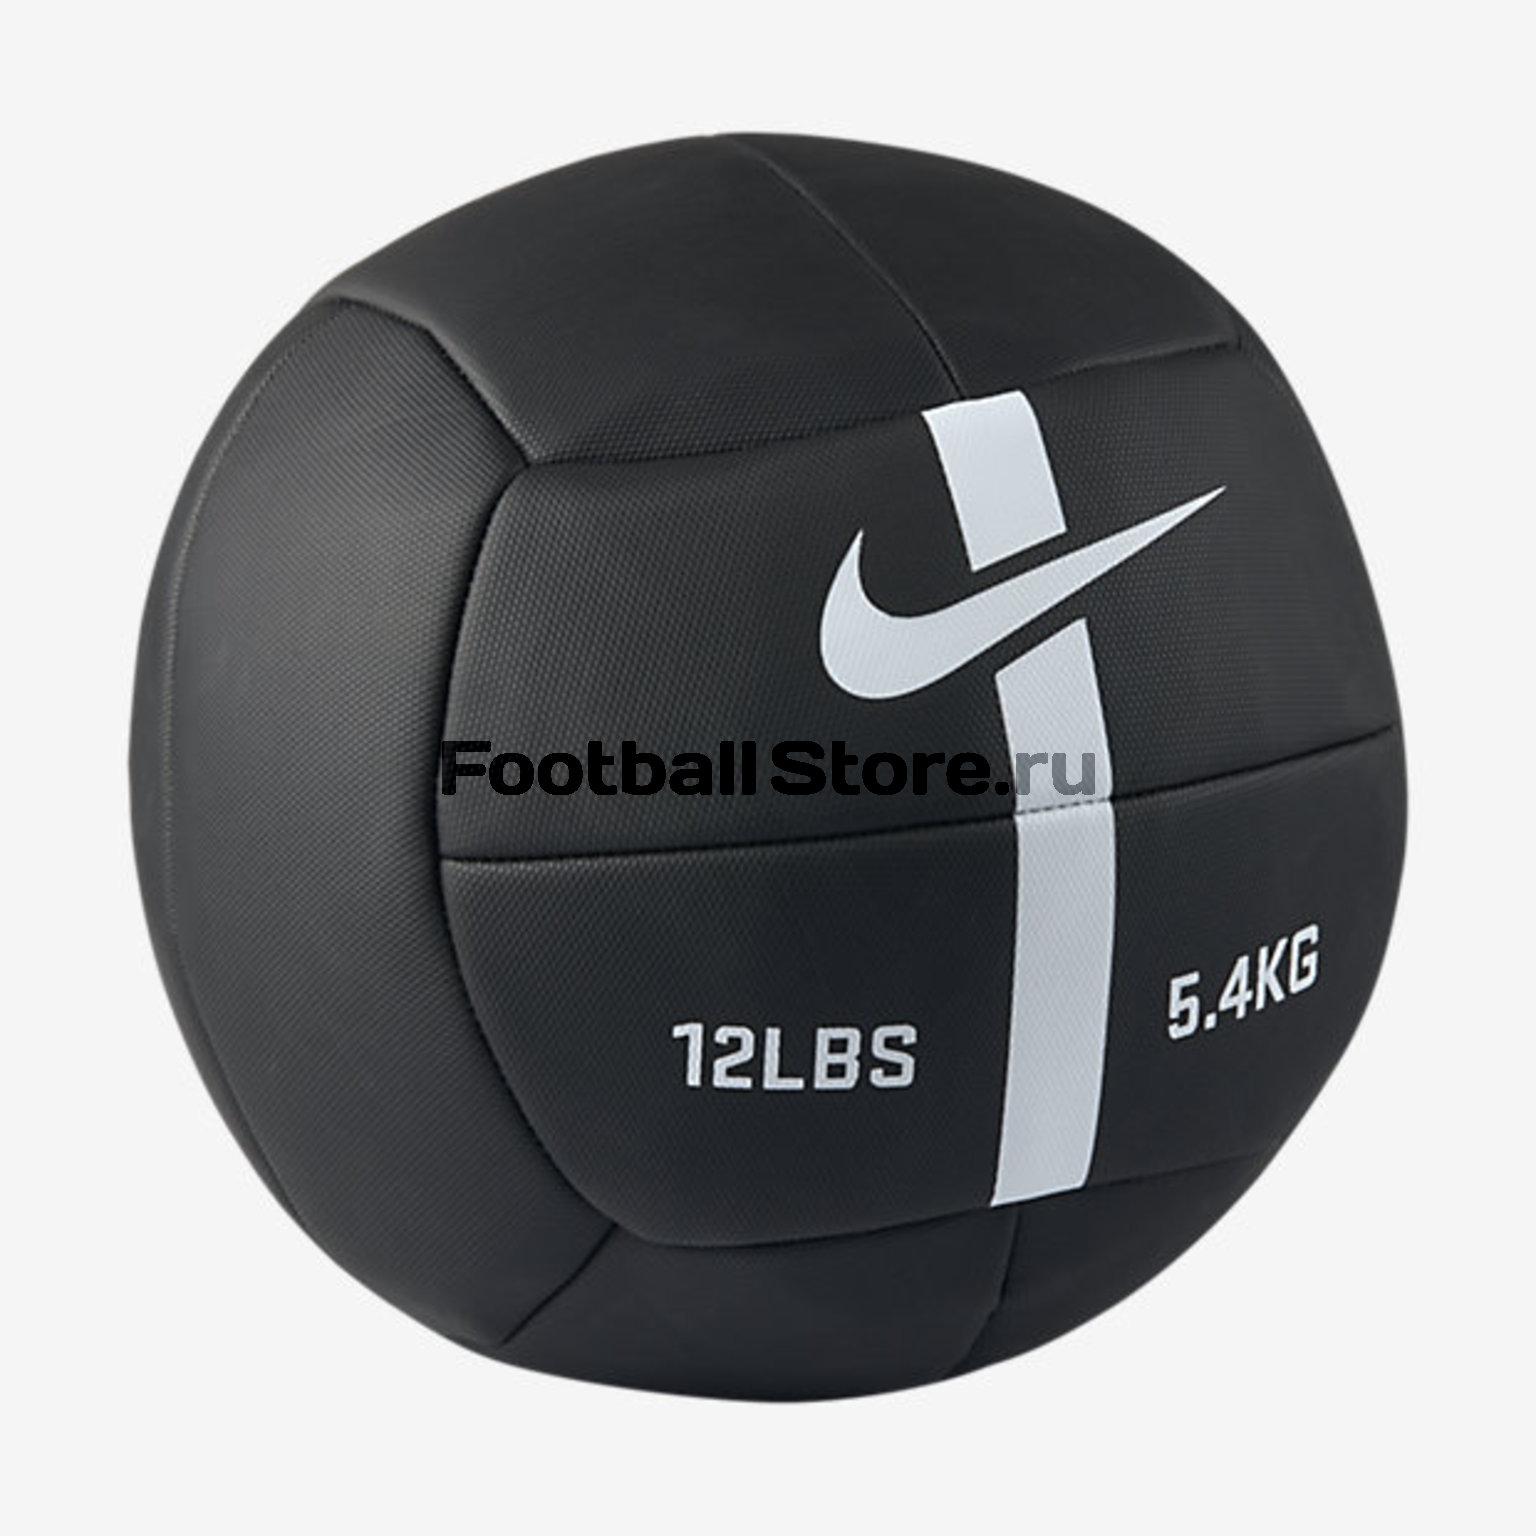 Мяч для тренировок Nike Strength Training Ball 12lb N.EW.07.010.NS cкакалка nike weighted rope 2 0 ns grey black bright citrus